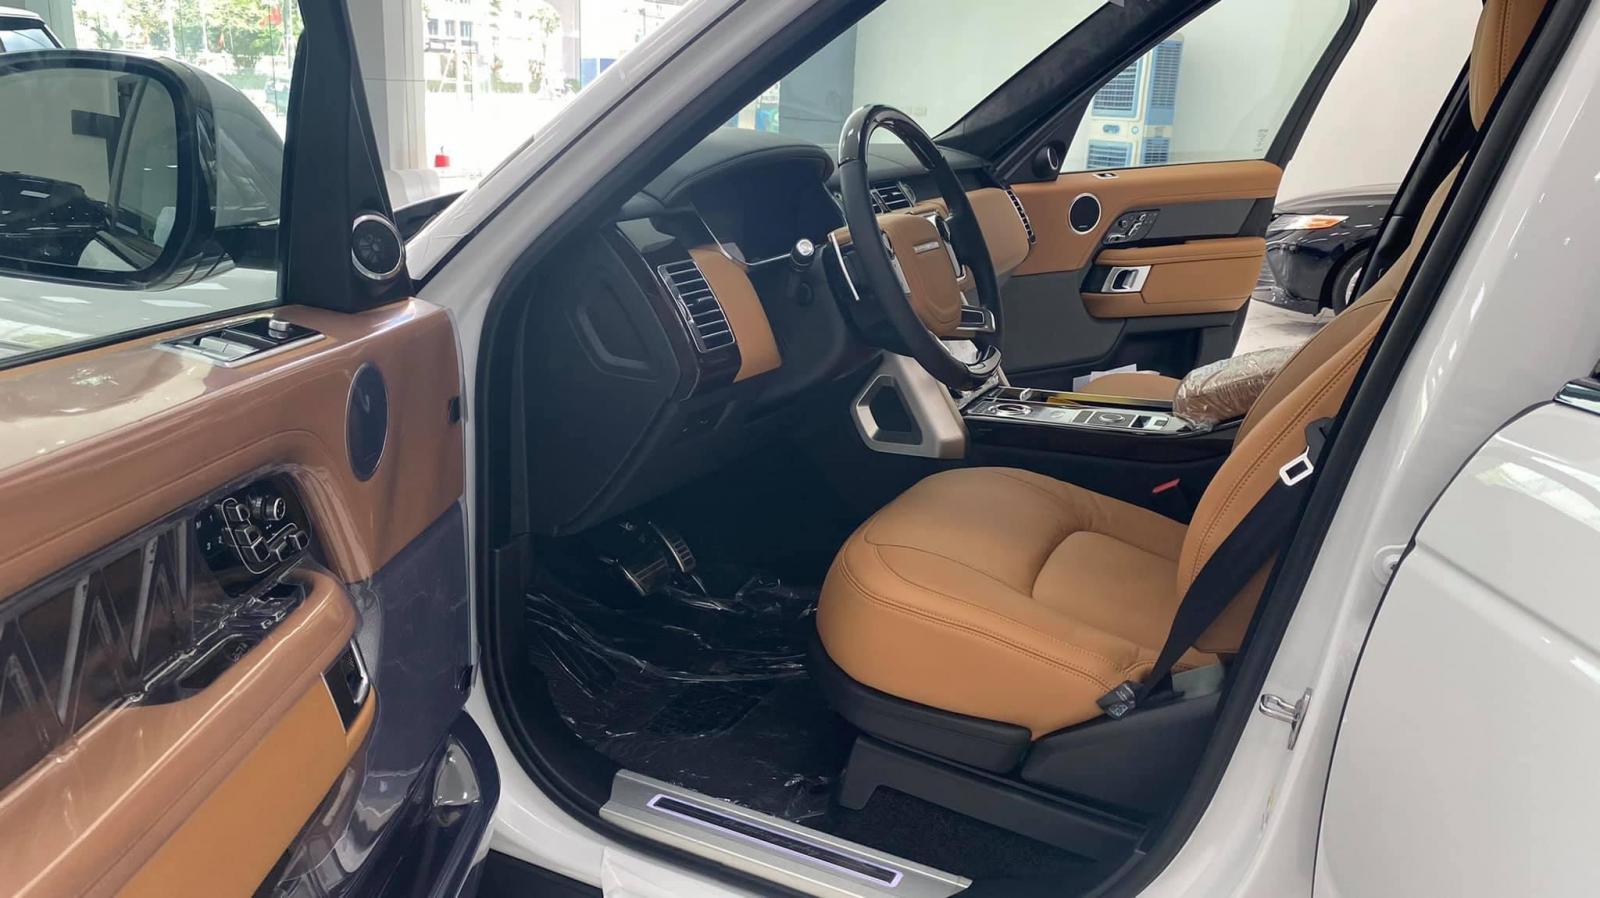 Bán Range Rover Autobiography LWB 3.0 sản xuất 2021, mới 100%. Xe giao ngay